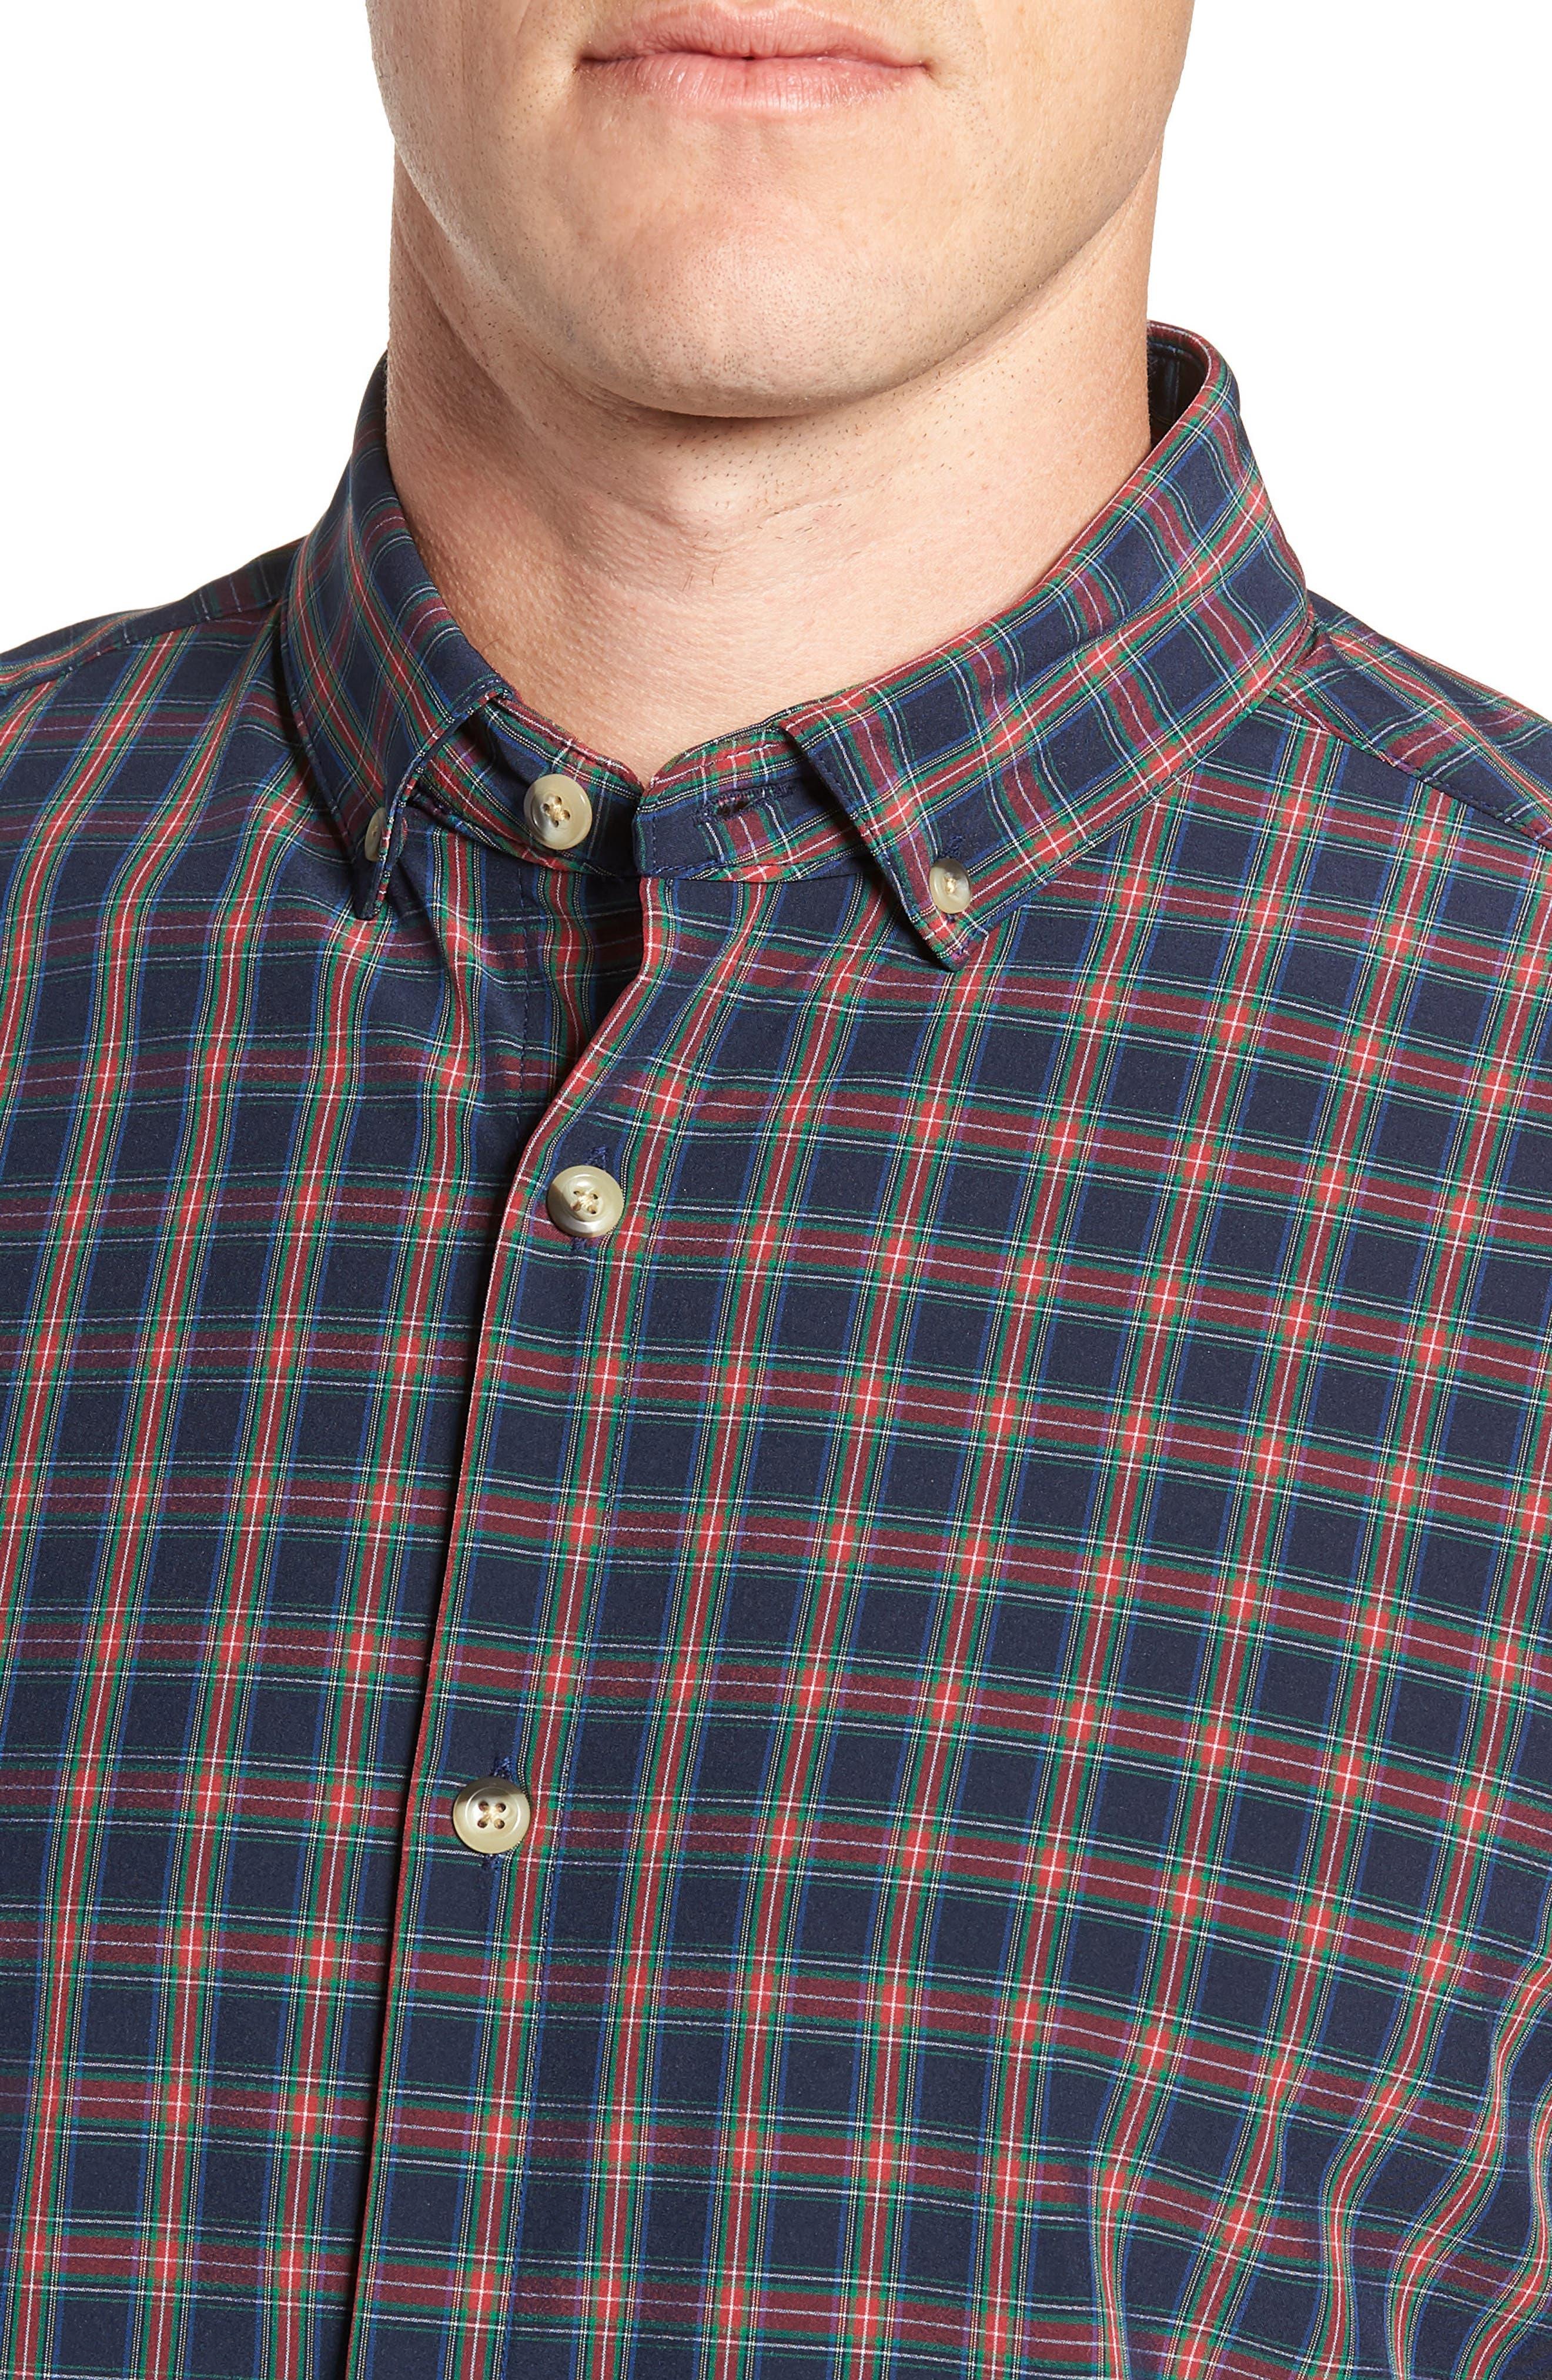 Lockhart Plaid Performance Sport Shirt,                             Alternate thumbnail 2, color,                             RED